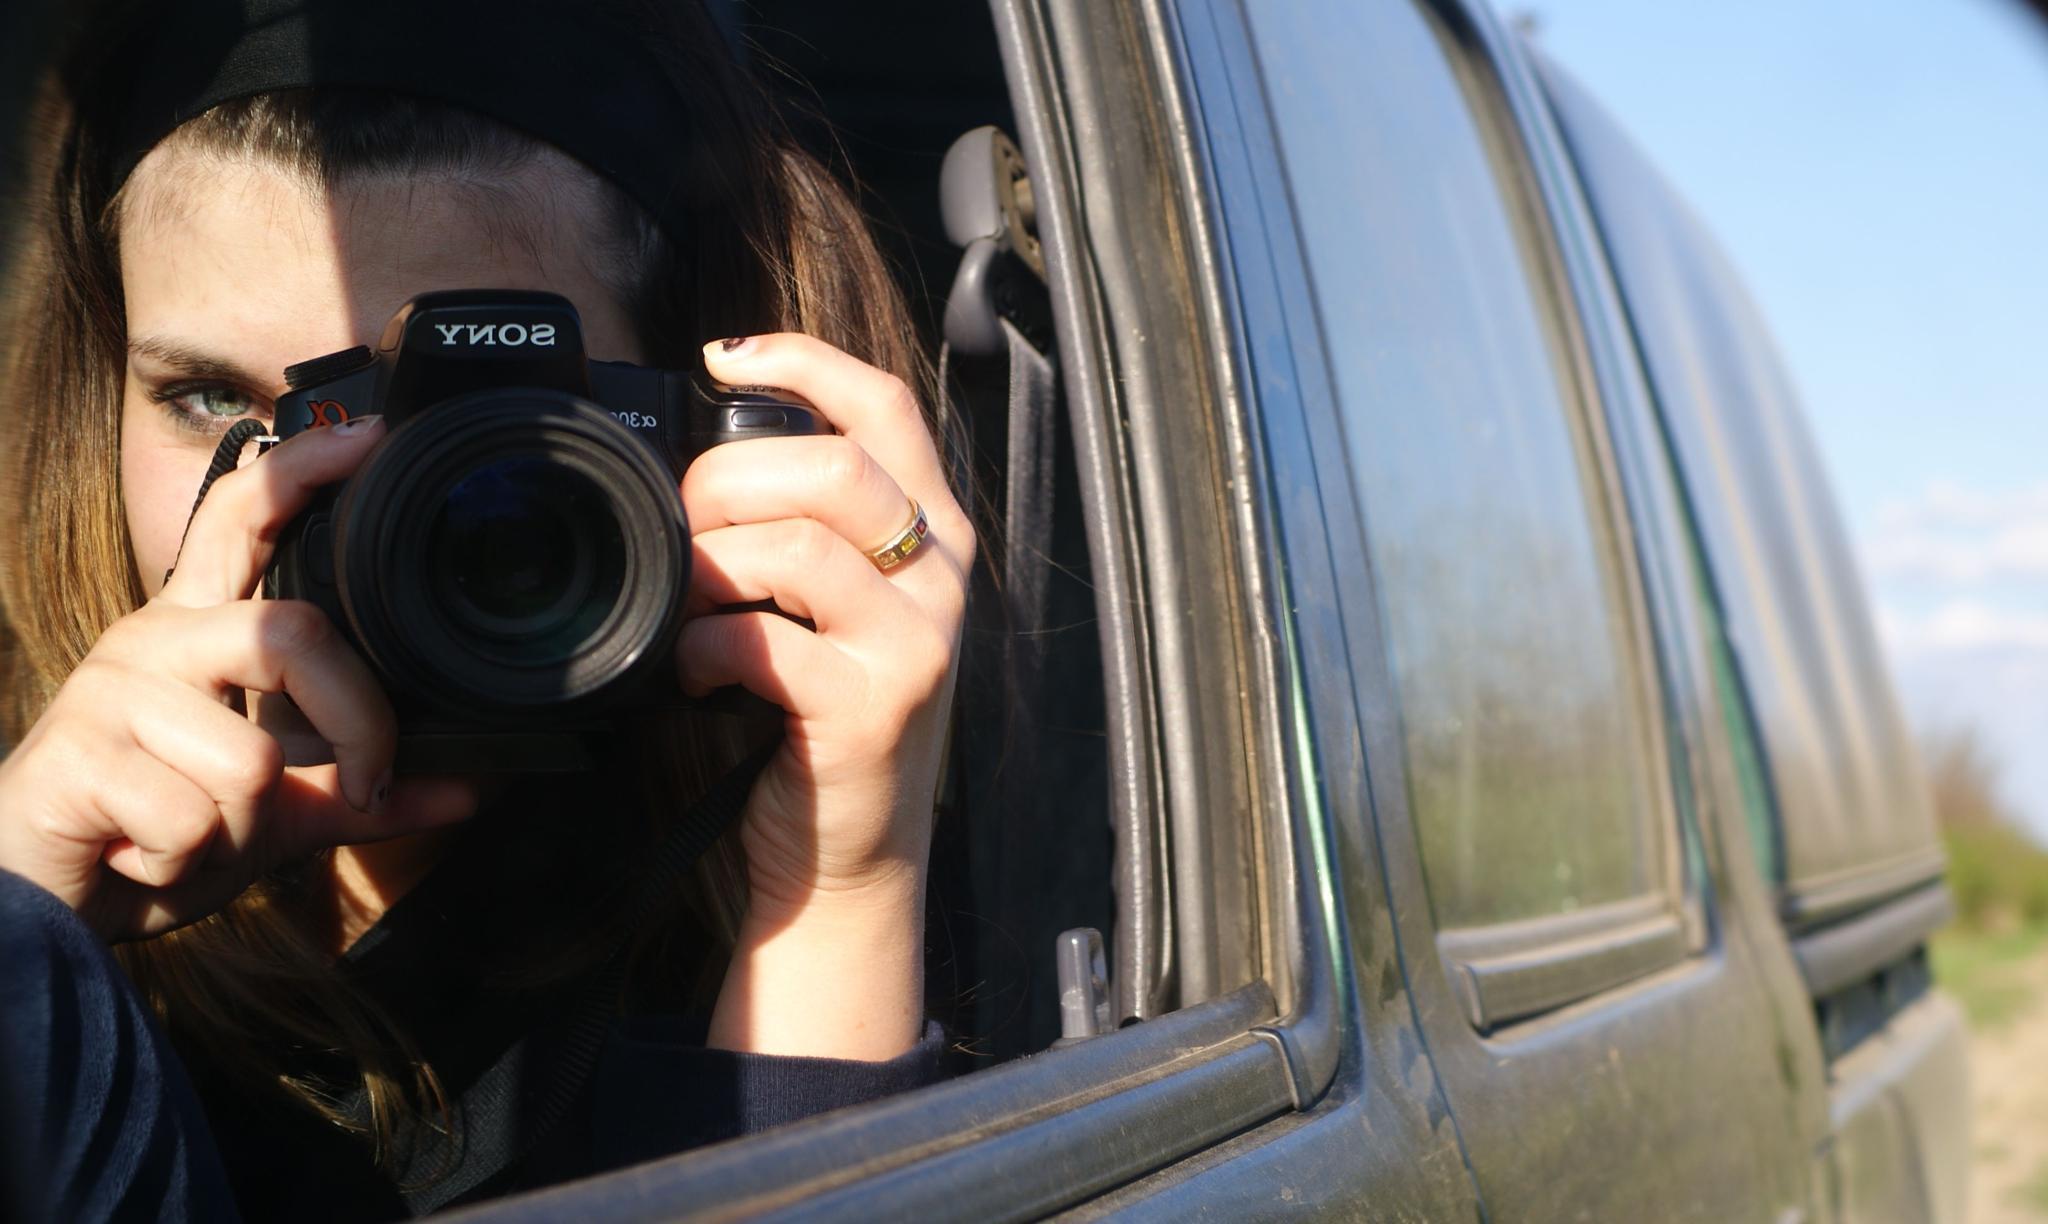 rearview mirror by hunyadigeza